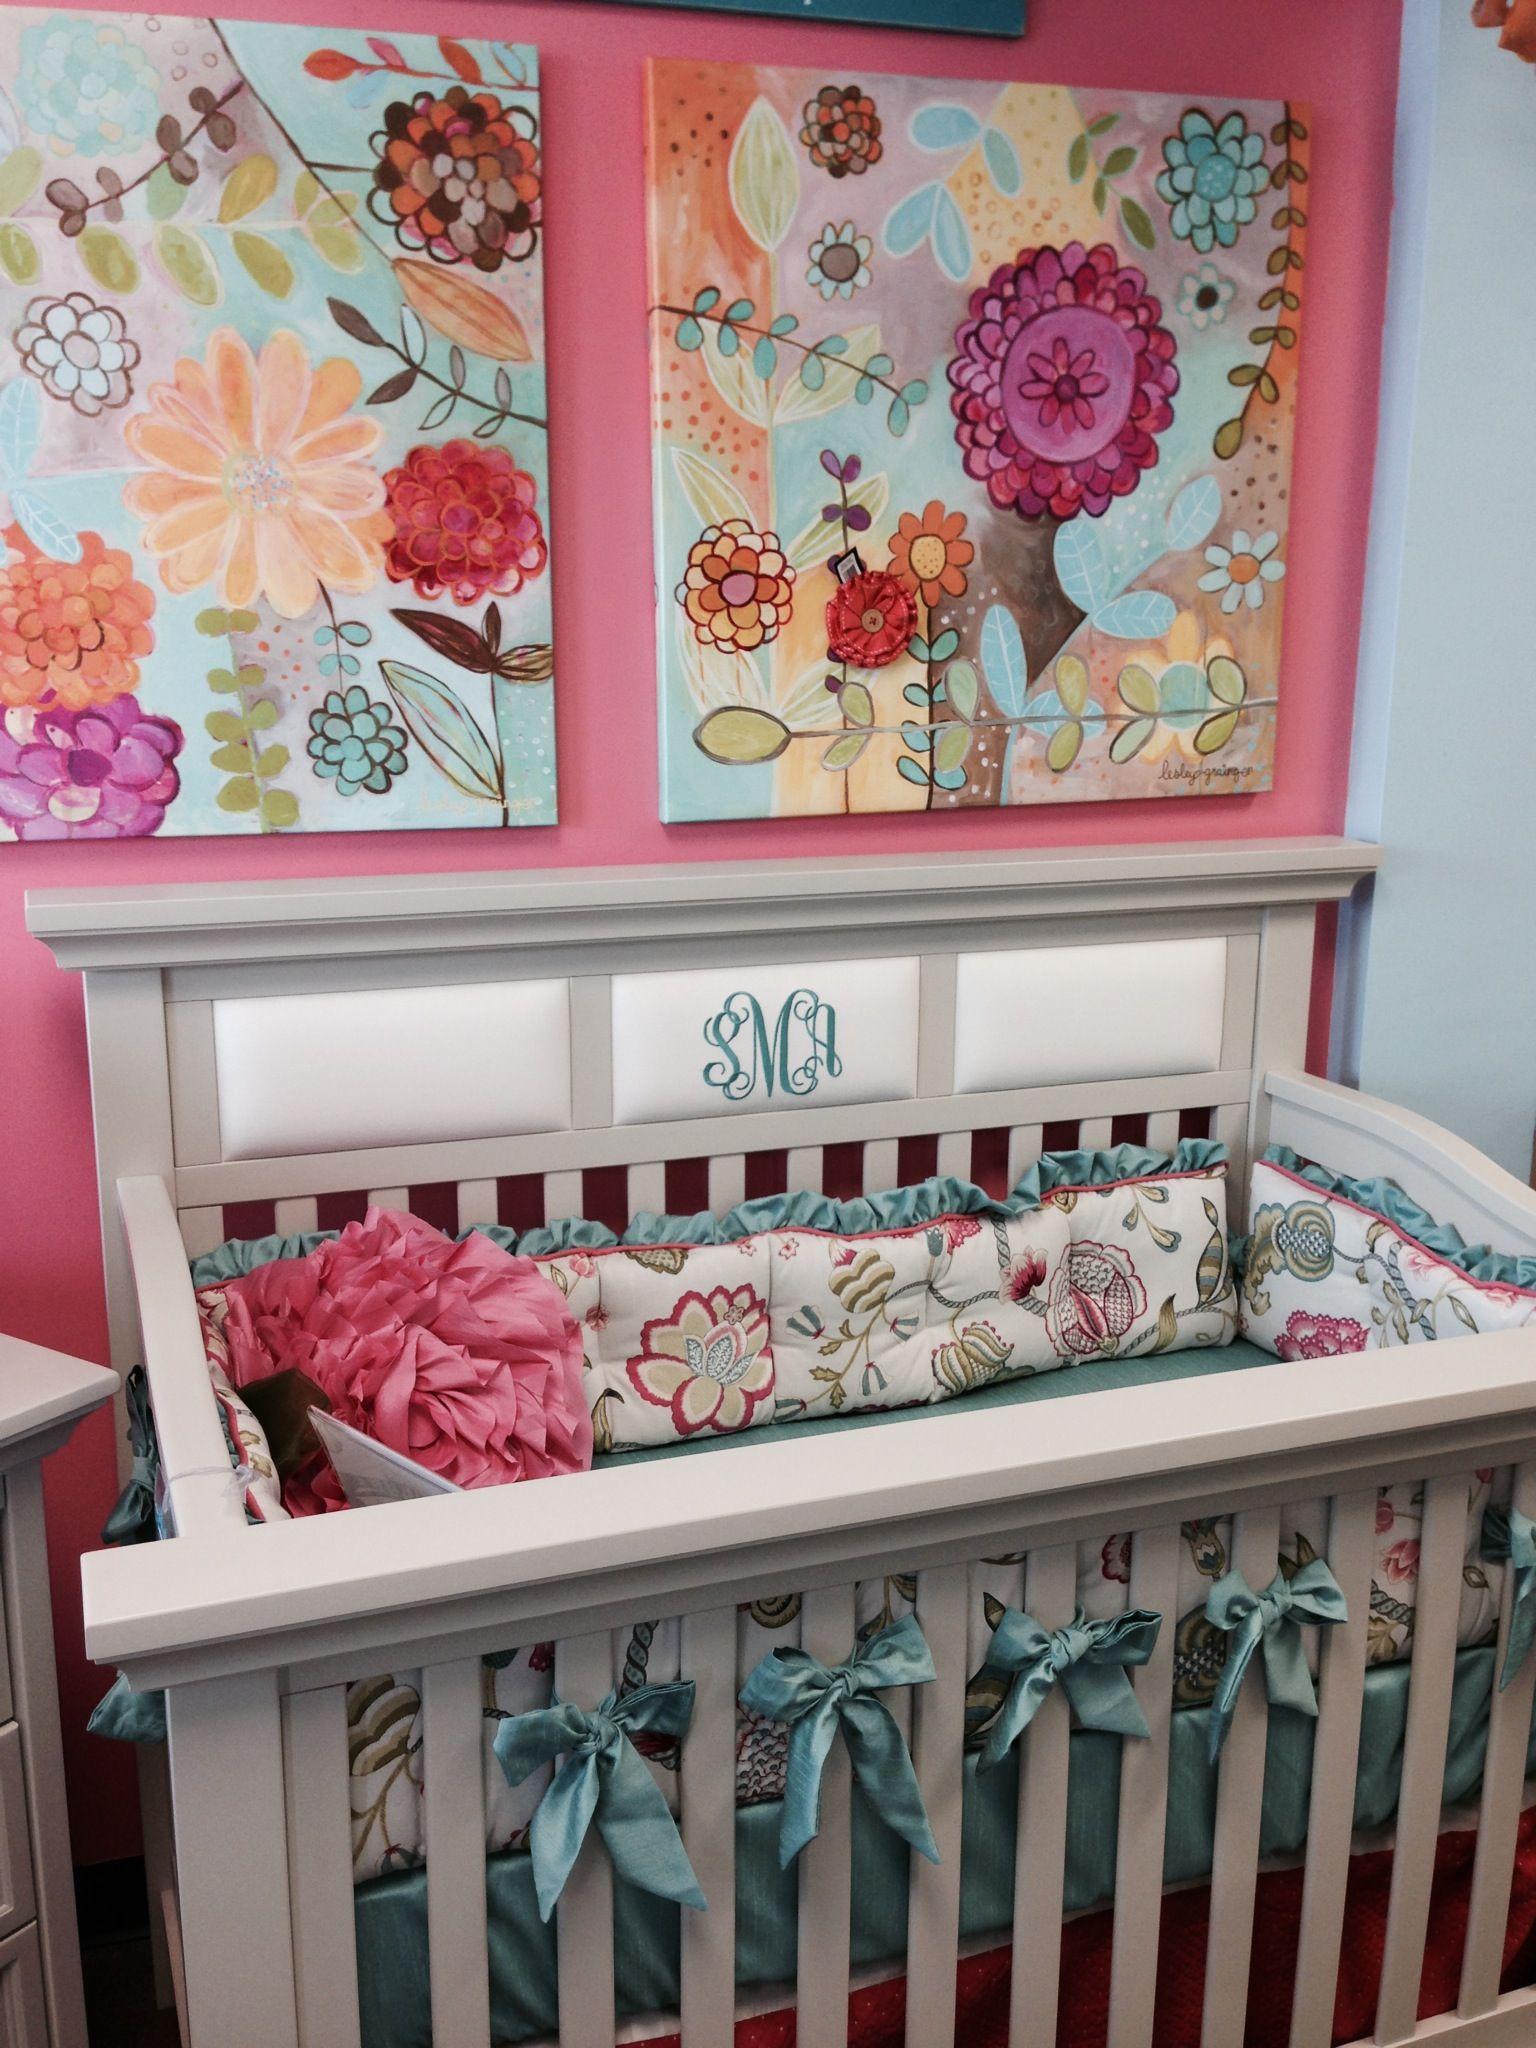 Arabella Floral Baby Crib Bumper Set With Aqua Ruffles And Ties On The  Arcadia Crib At Babyu0027s Furniture In Houston, TX